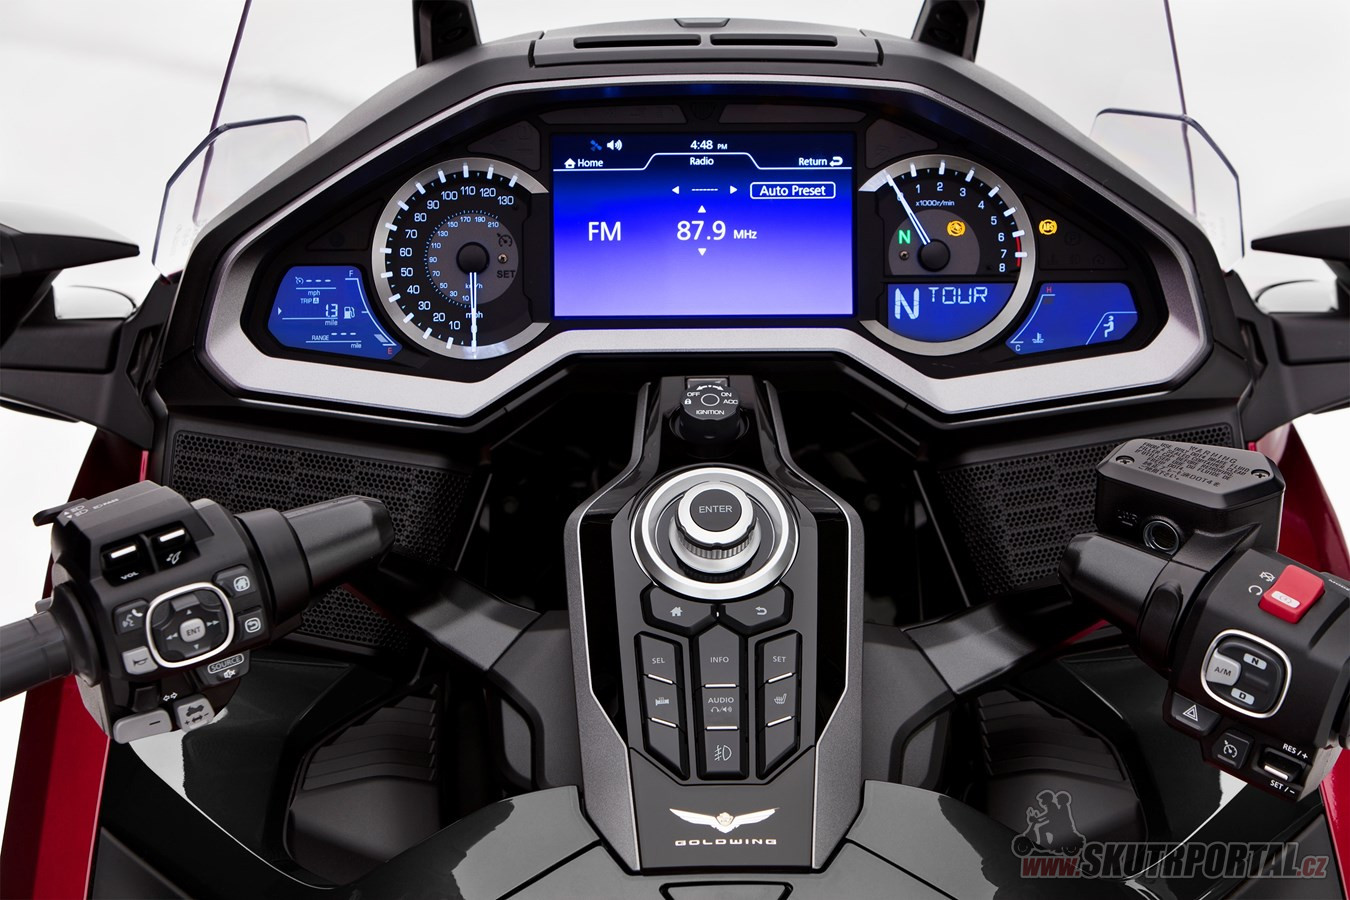 Honda GL1800 Gold Wing Tour 2021